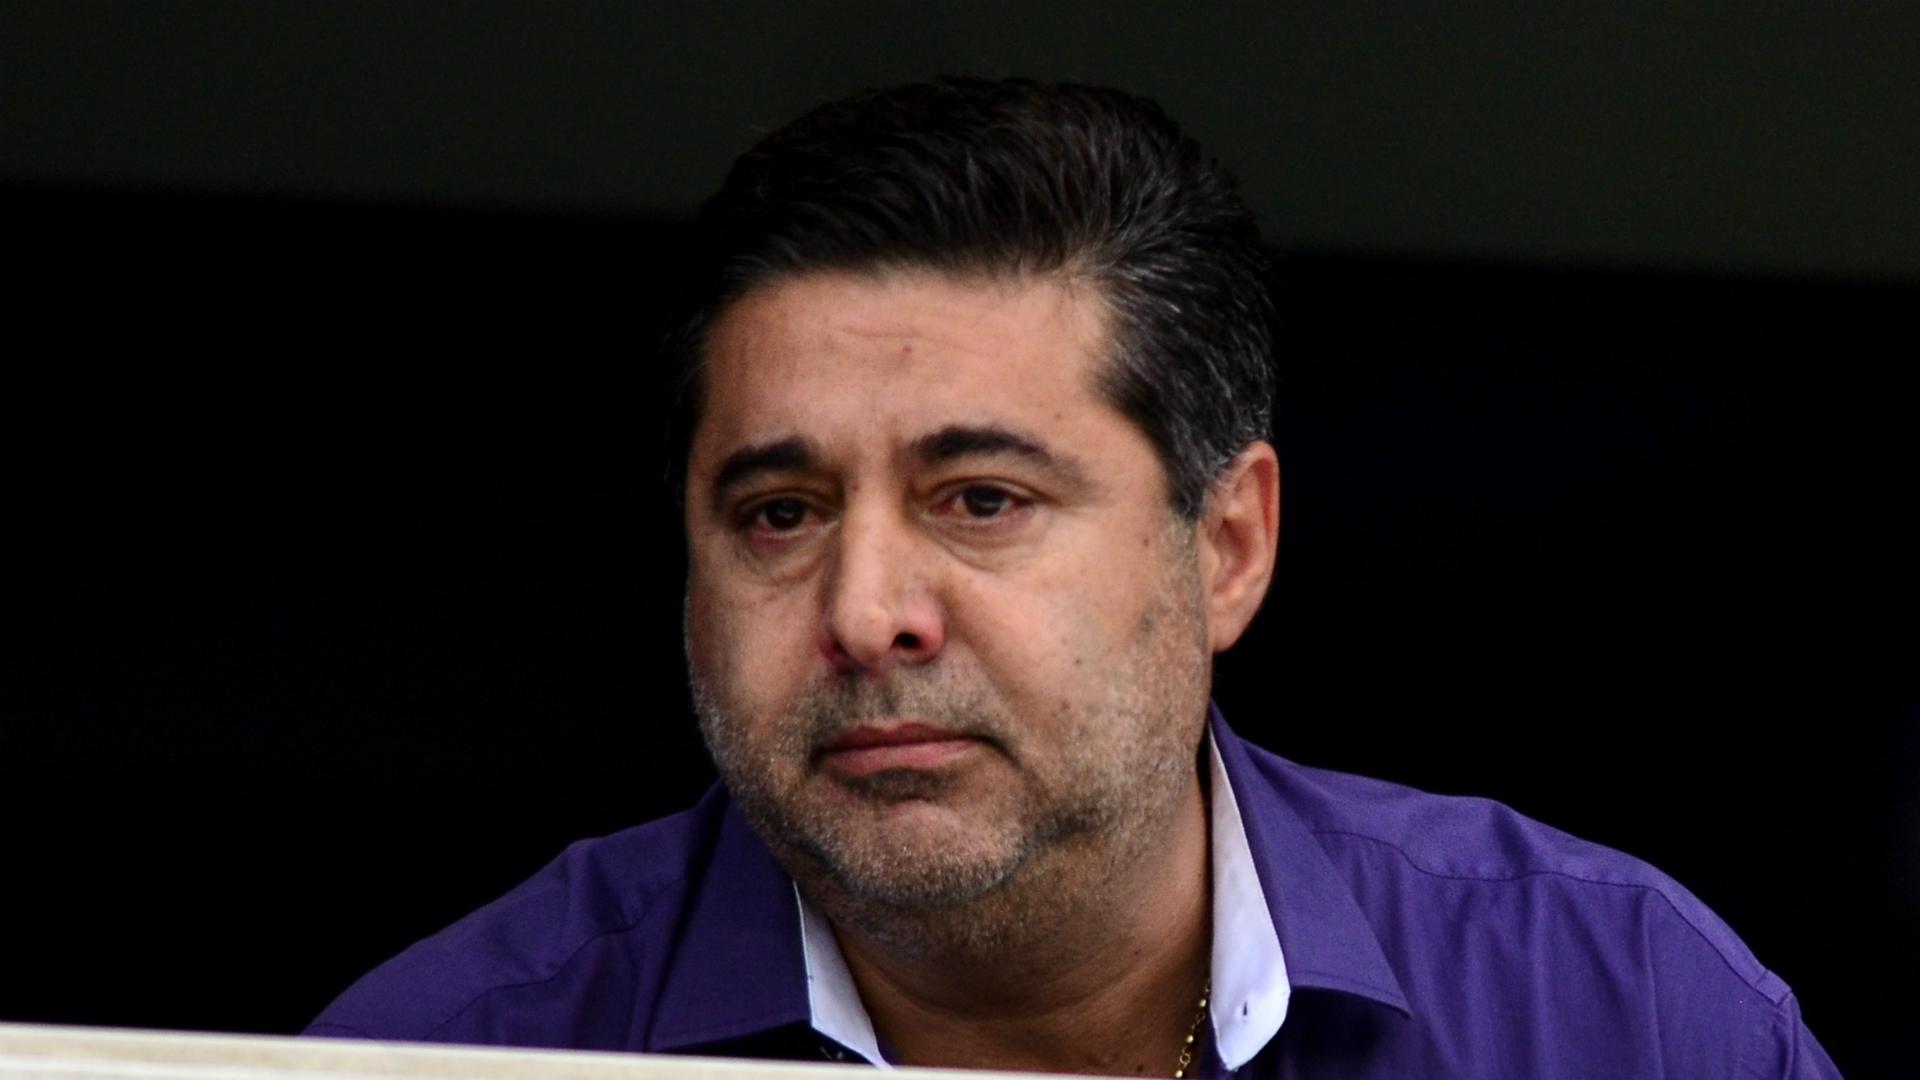 Defender Leonardo Balerdi is set to complete a move to Borussia Dortmund, according to Boca Juniors president Daniel Angelici.